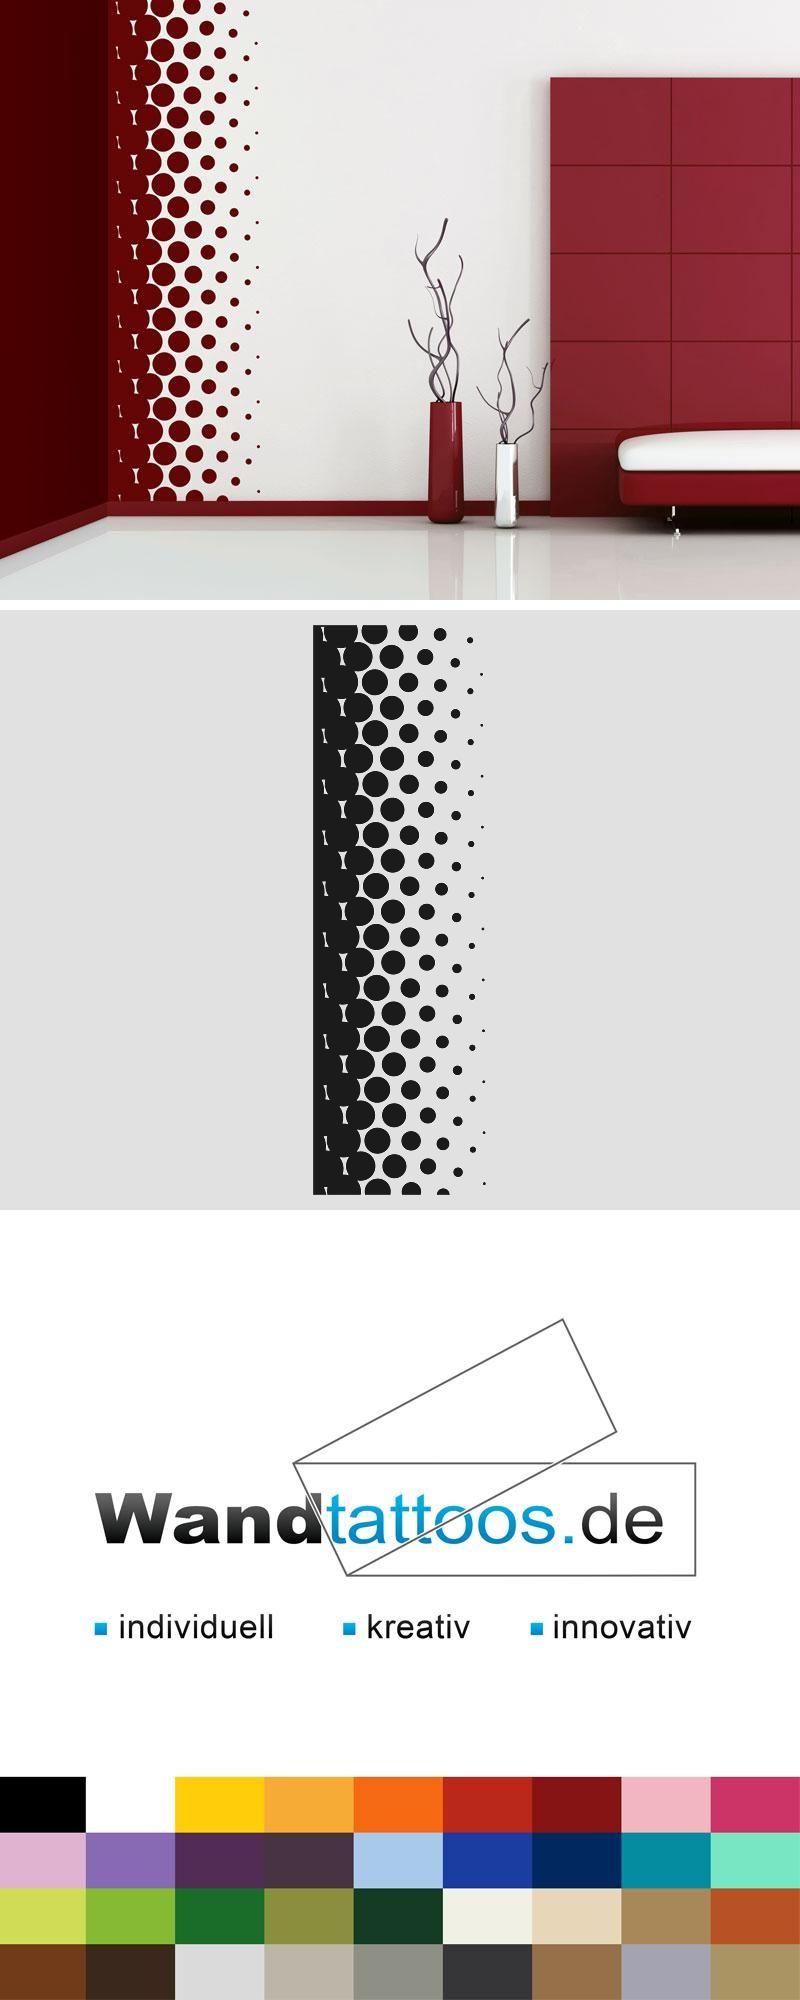 Einfache home-office-design-idee wandbanner design punkte  wandtattoo raumhoch  walls wall ideas